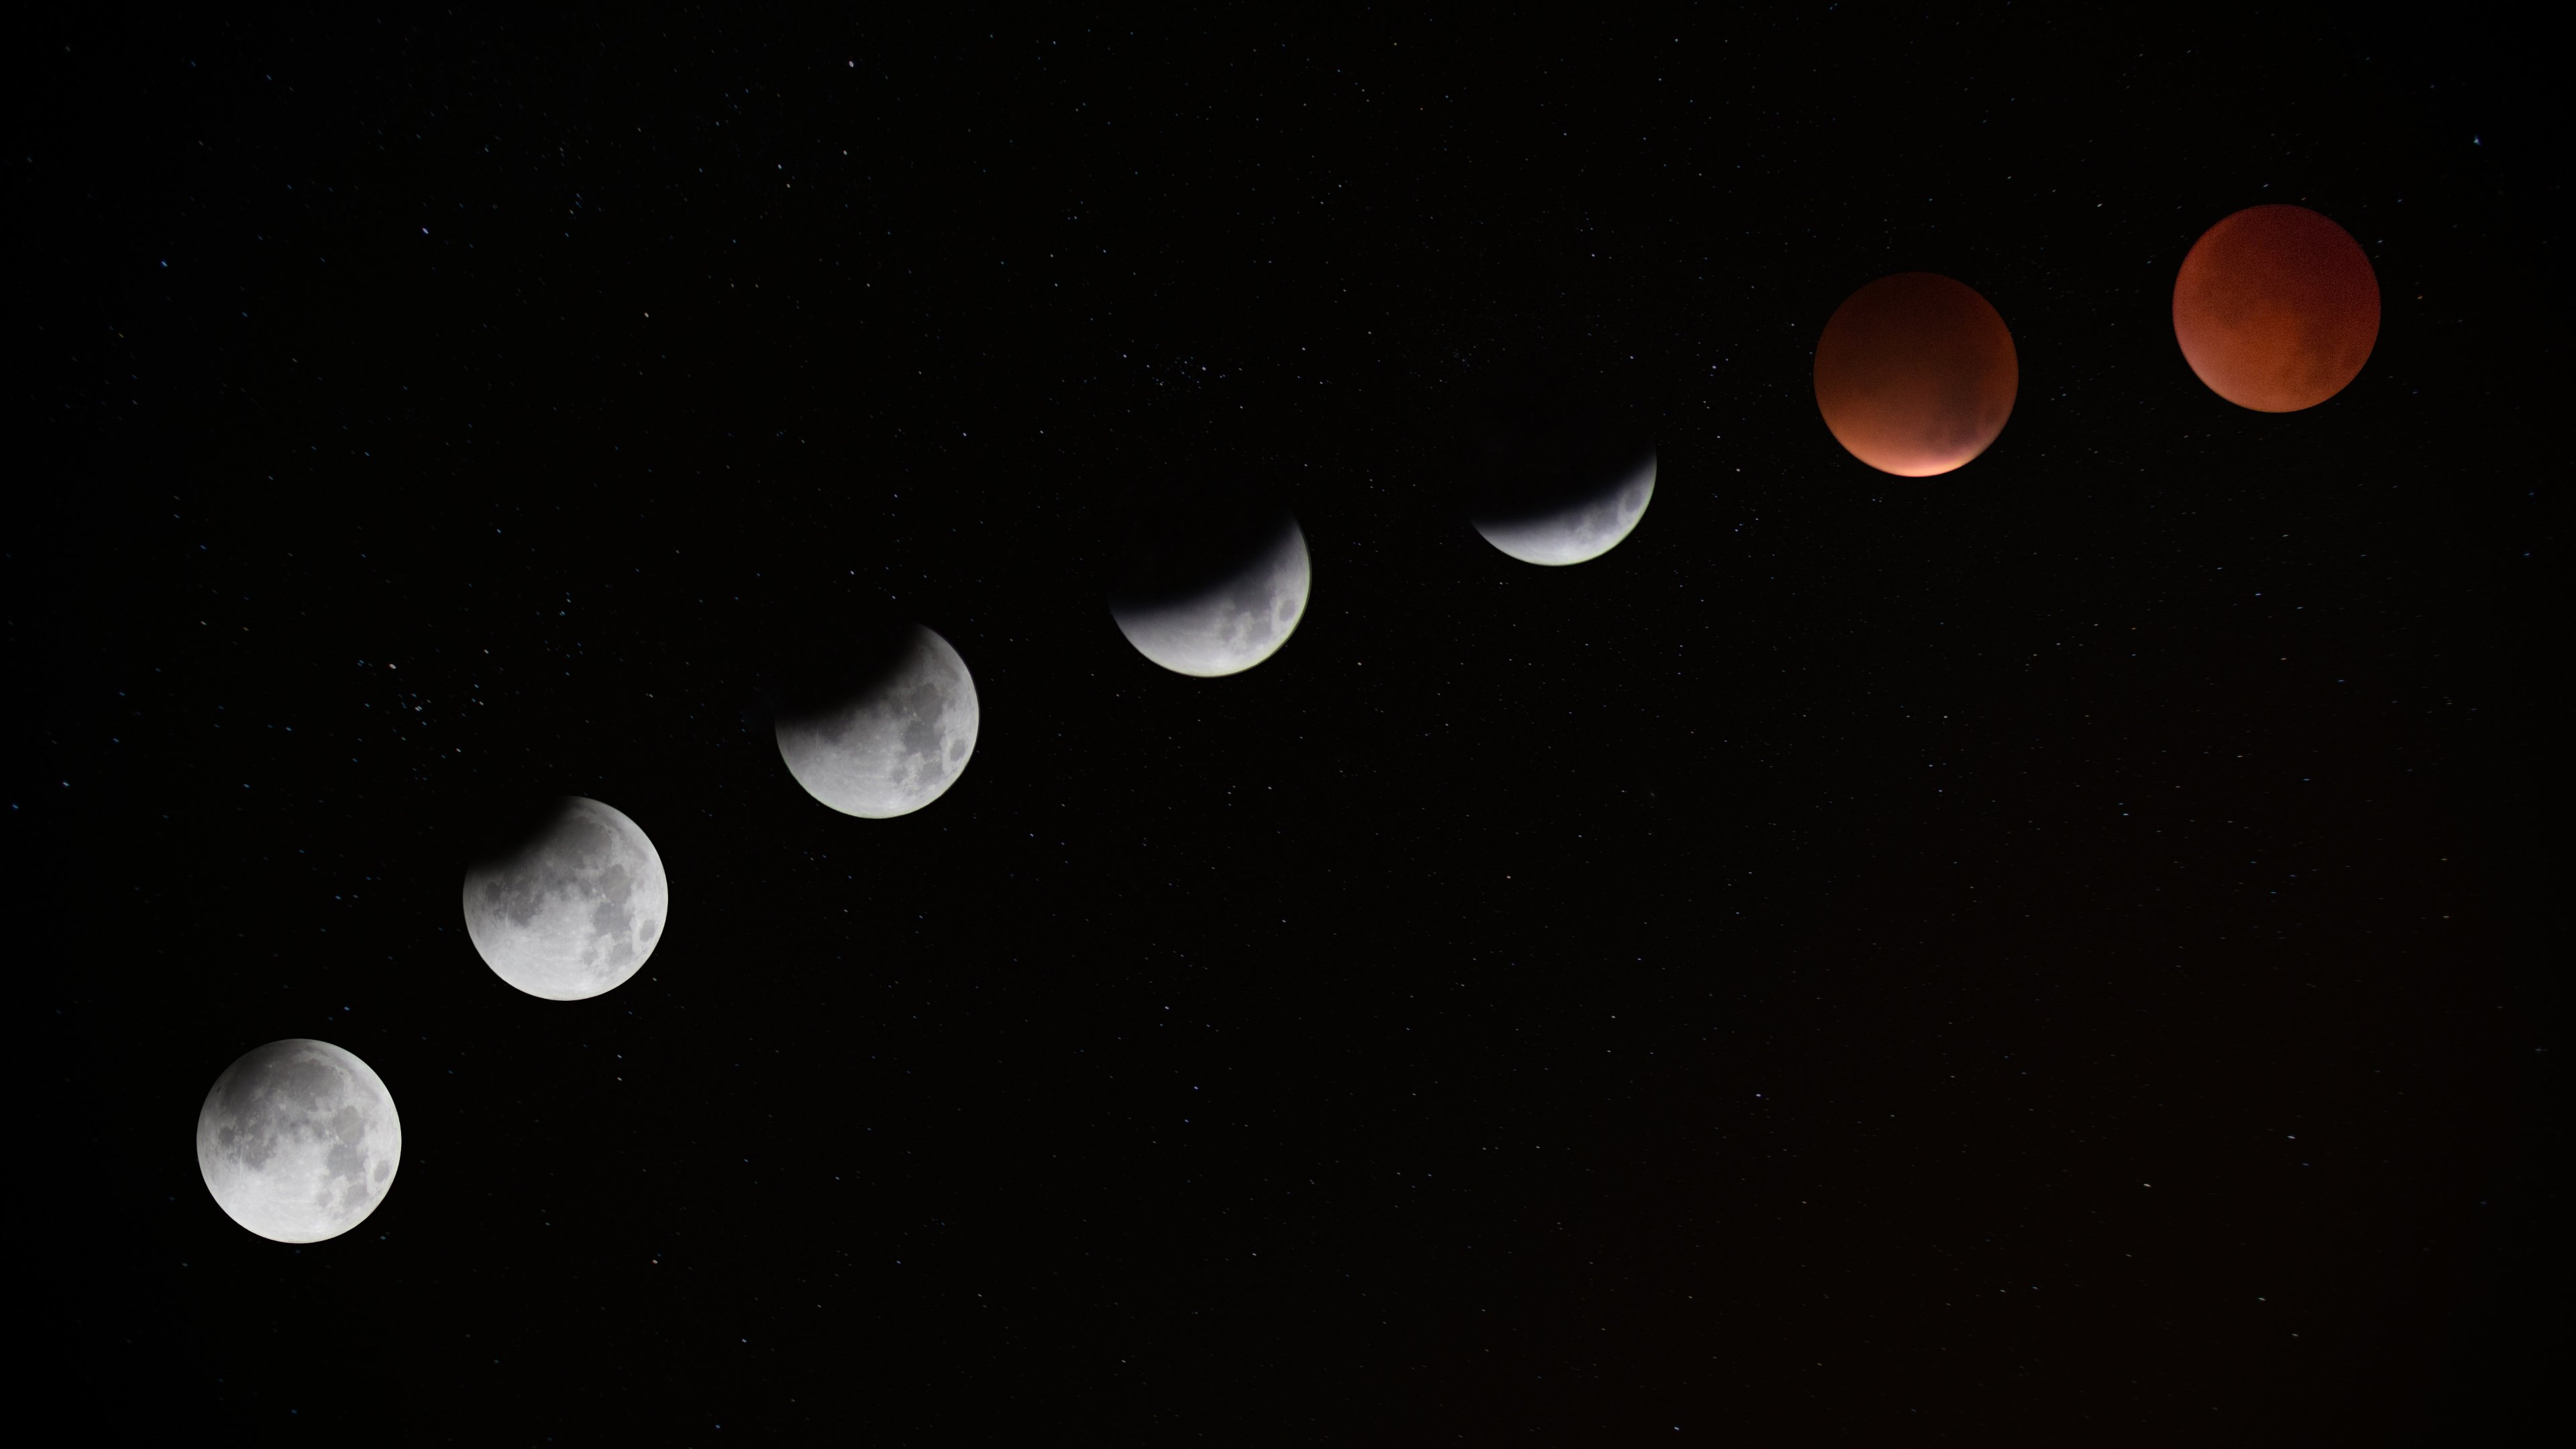 Moon 4k Wallpaper Posted By John Johnson